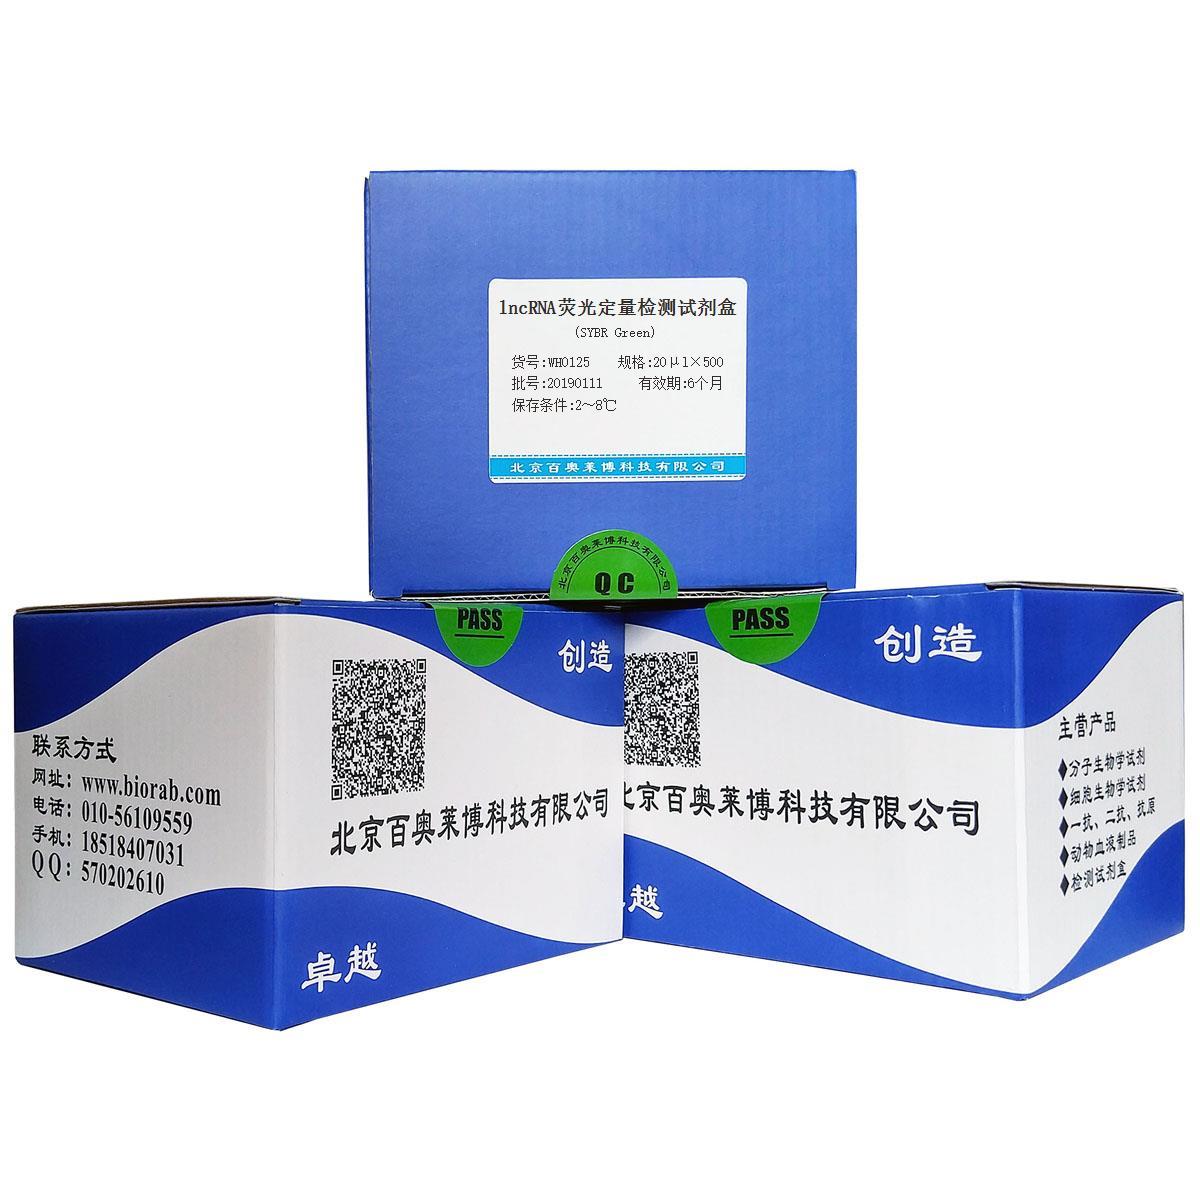 lncRNA荧光定量检测试剂盒(SYBR Green)